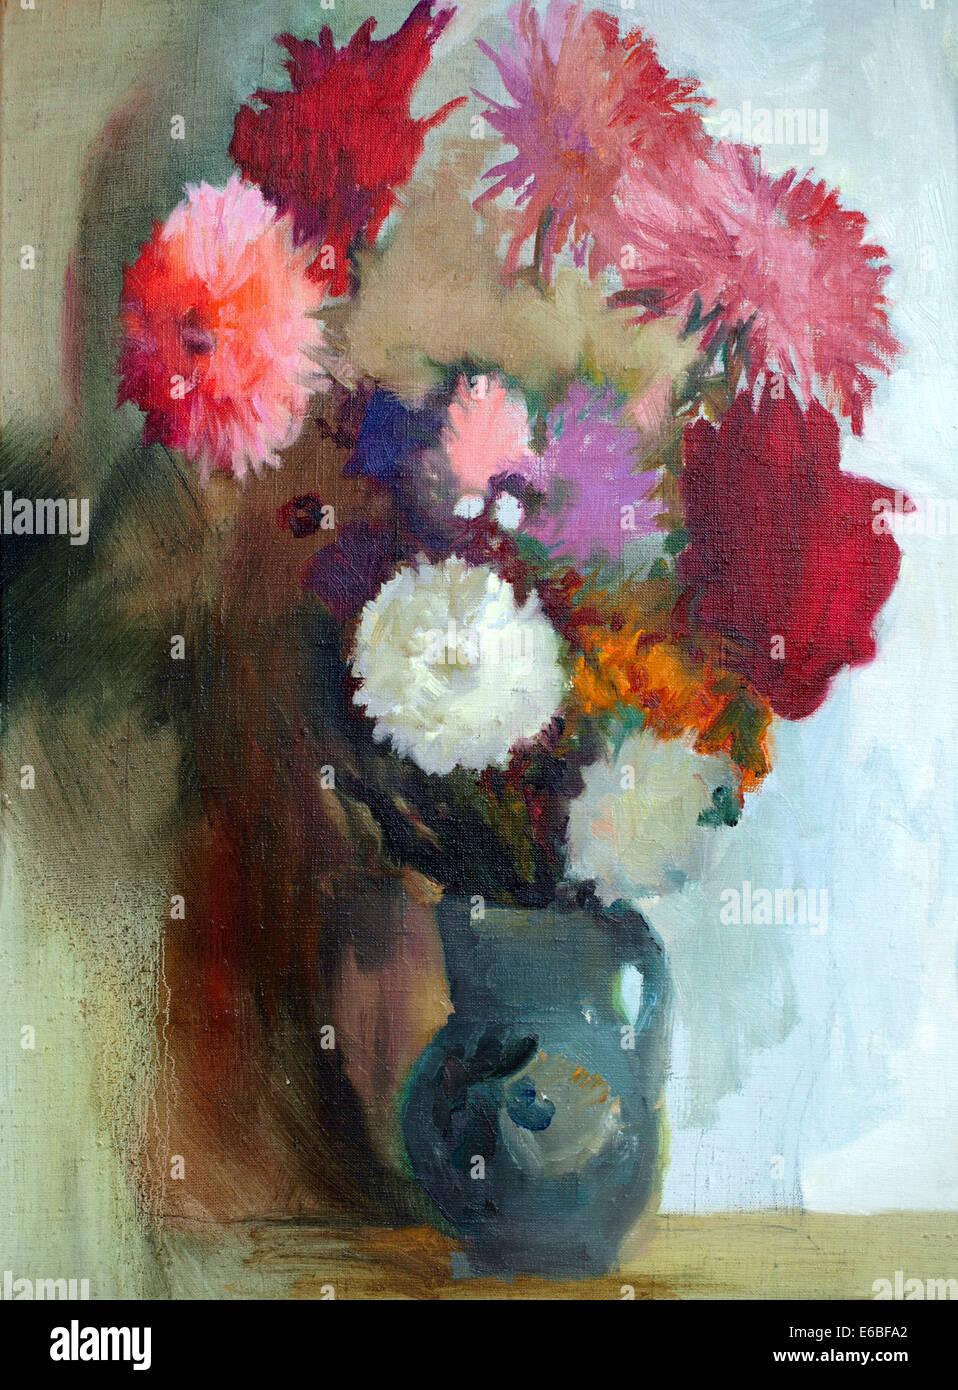 Oil Painting Beautiful Flowers Stock Photos Oil Painting Beautiful